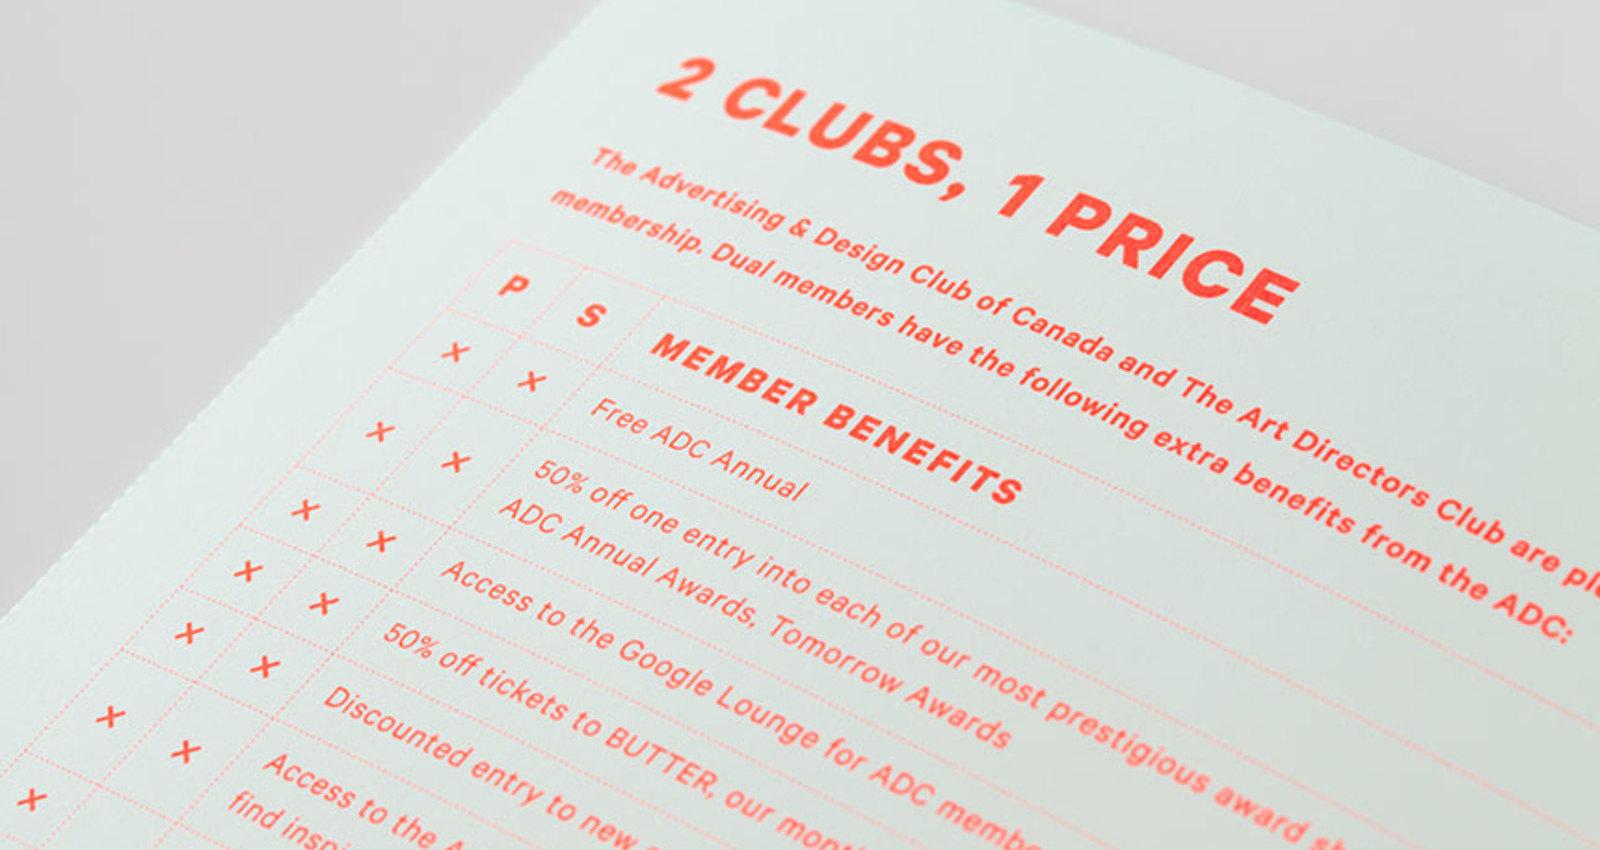 ADCC Membership Brochure